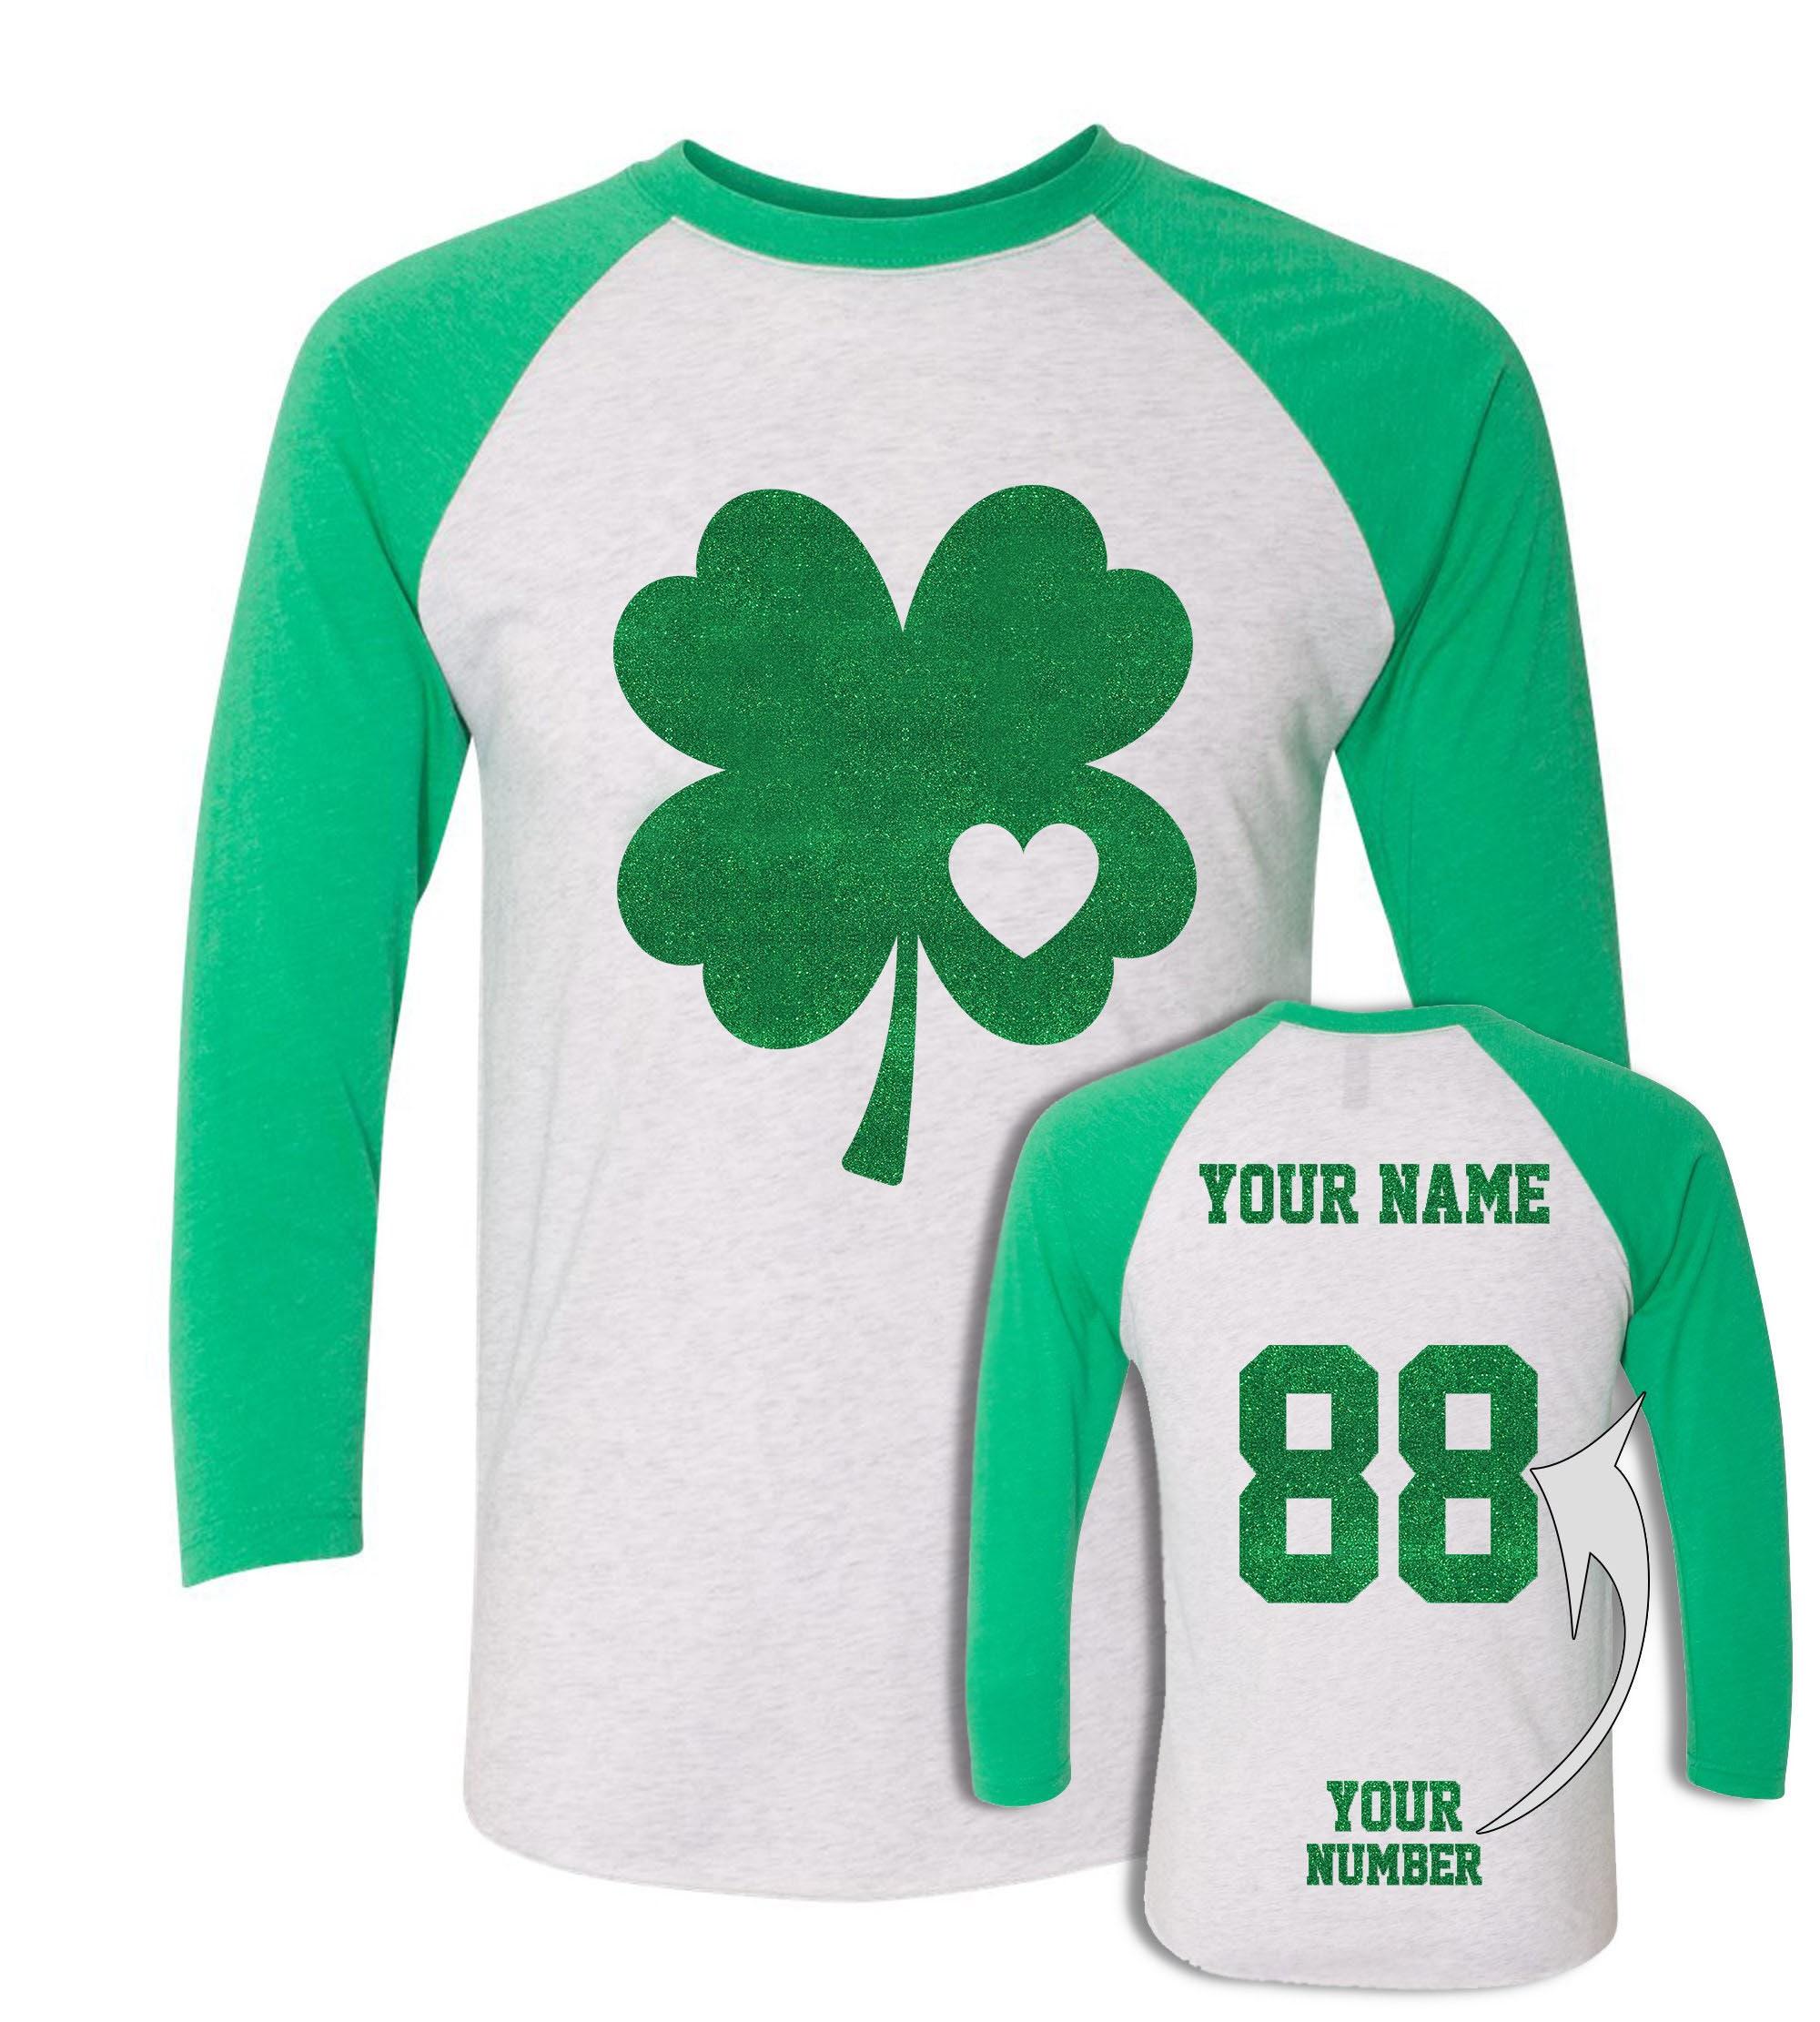 Sparkly Glitter St Patricks Day T Shirts Custom Jersey Etsy